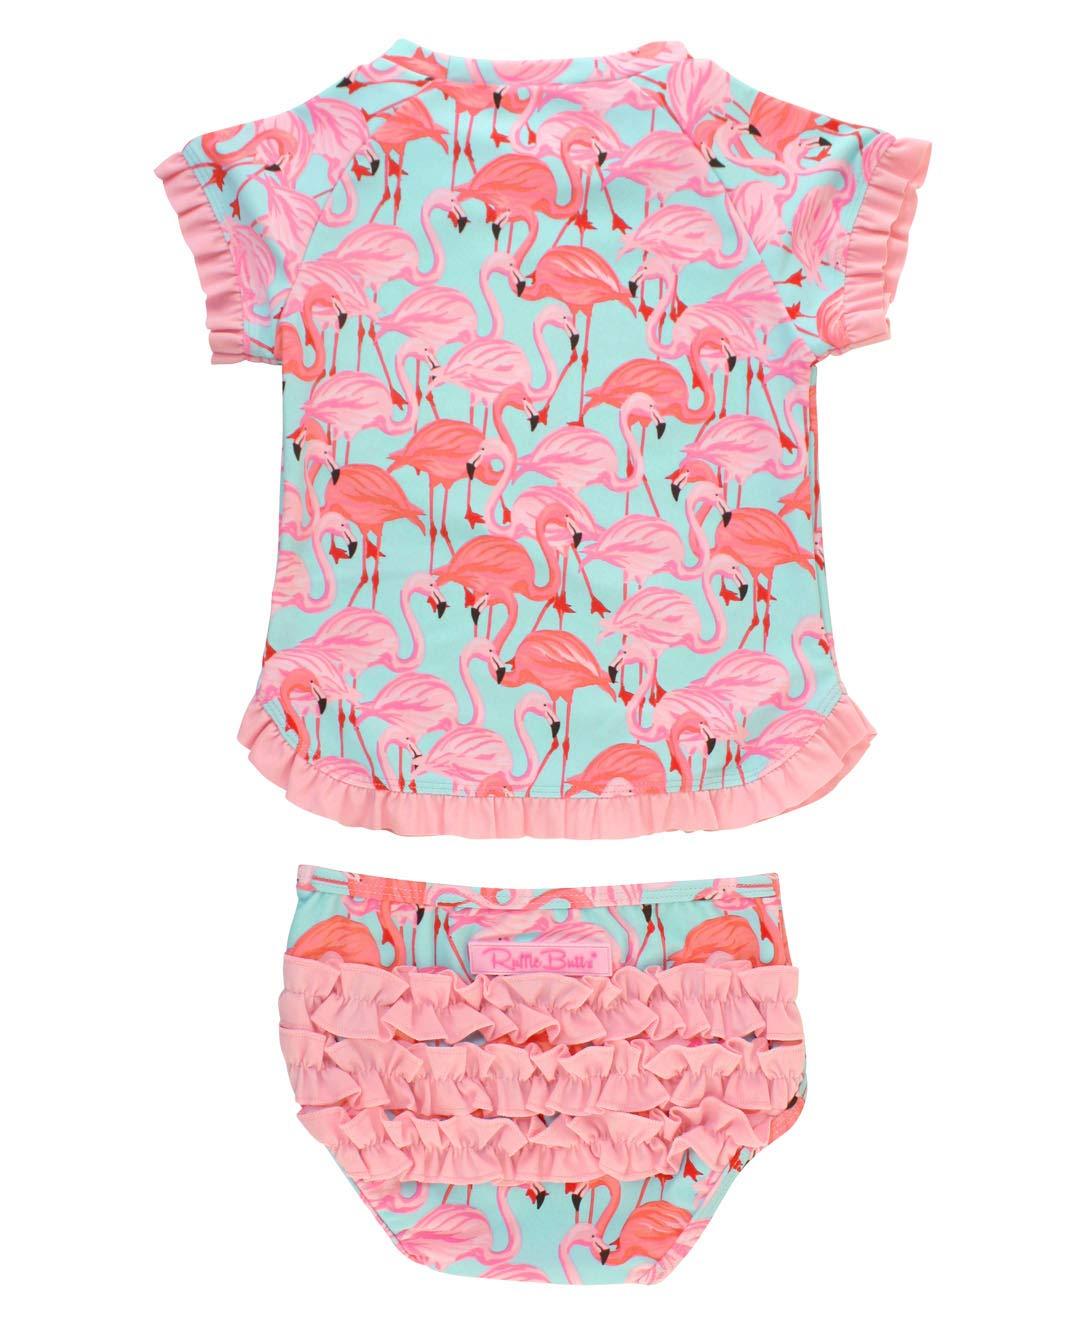 e8be5008ade4d RuffleButts Little Girls UPF 50+ 2-Piece Short Sleeve Rash Guard Bikini w/